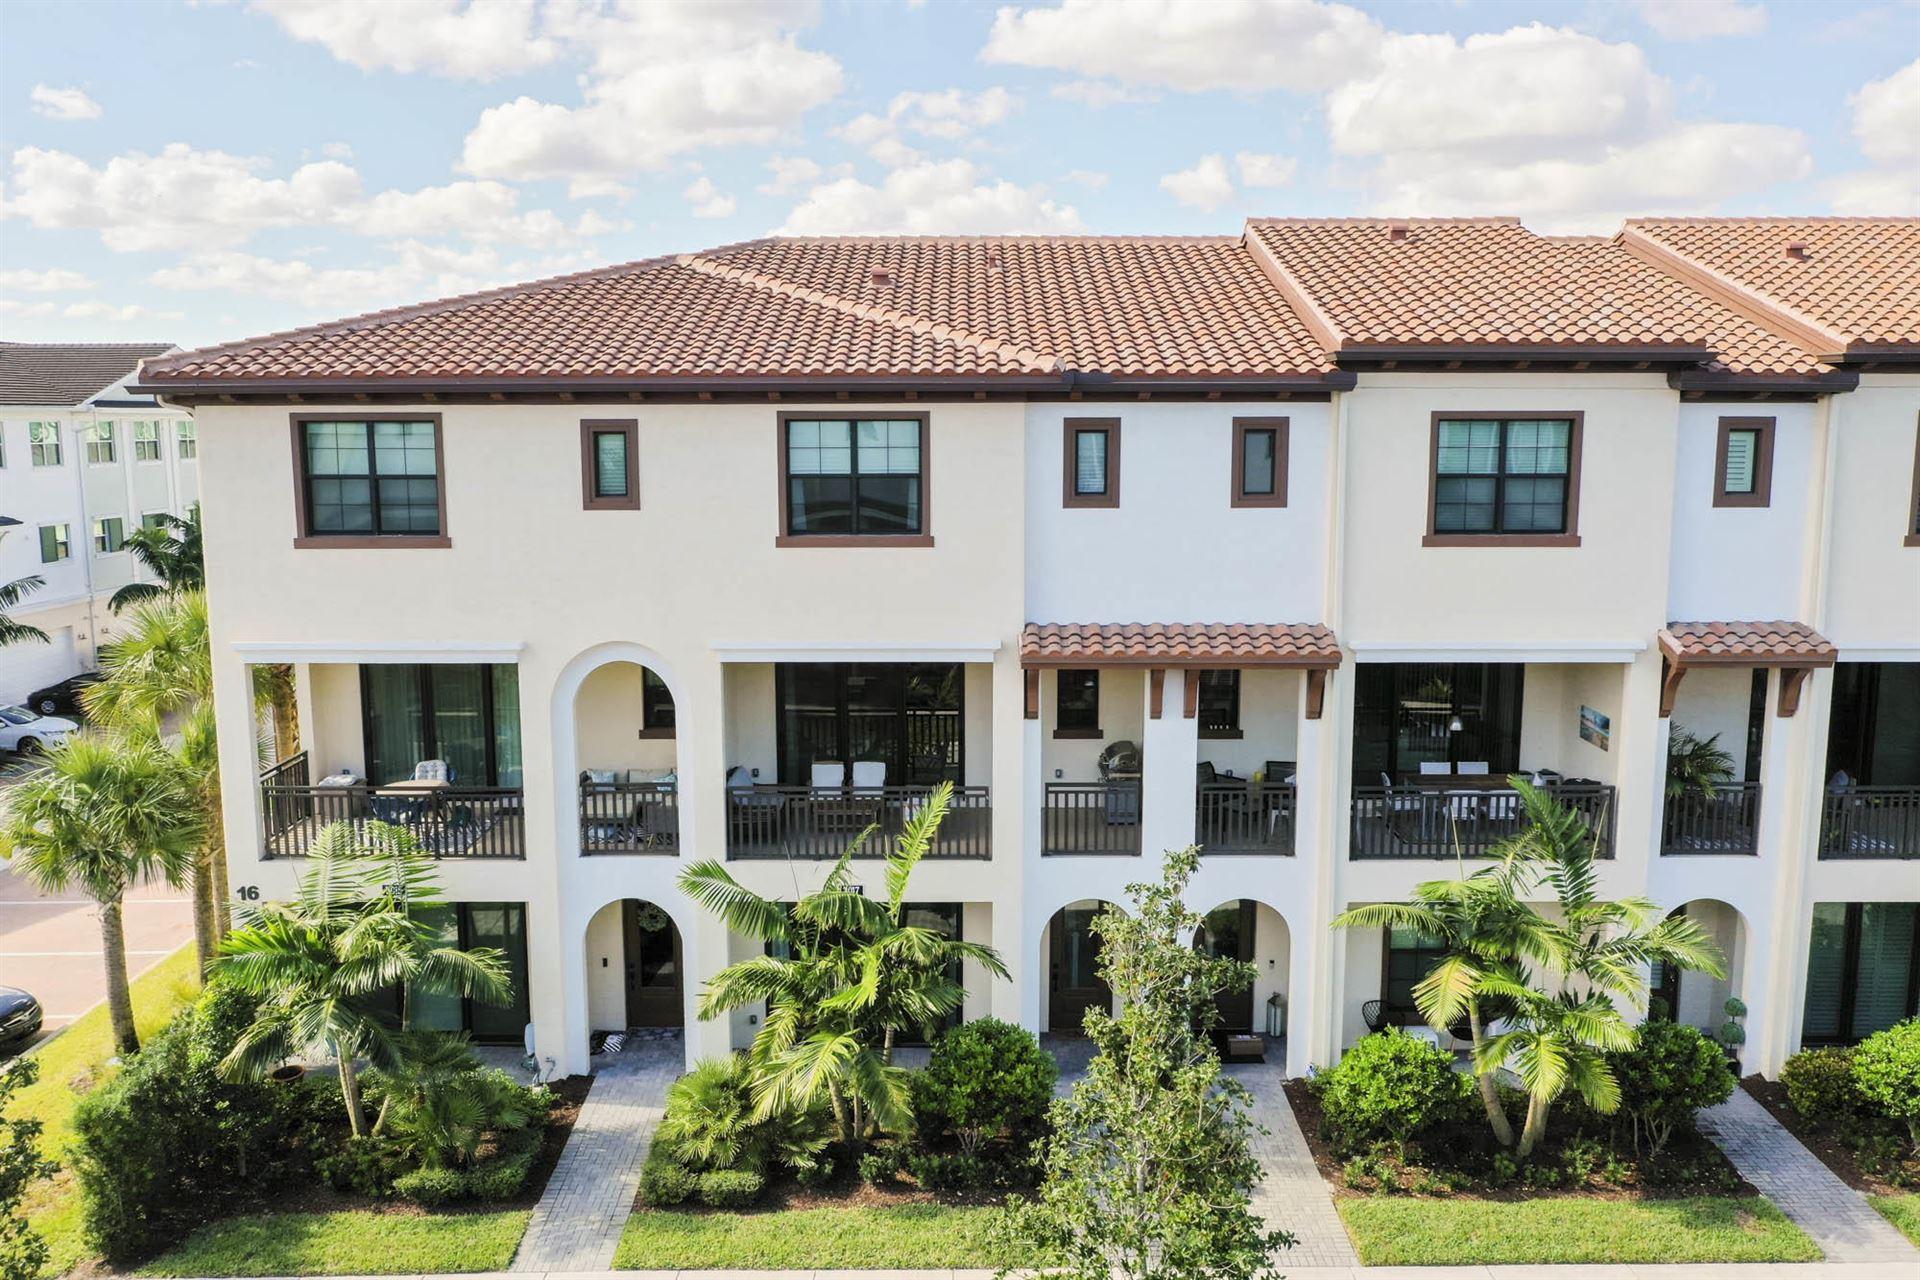 3017 Franklin Place, Palm Beach Gardens, FL 33418 - #: RX-10683145